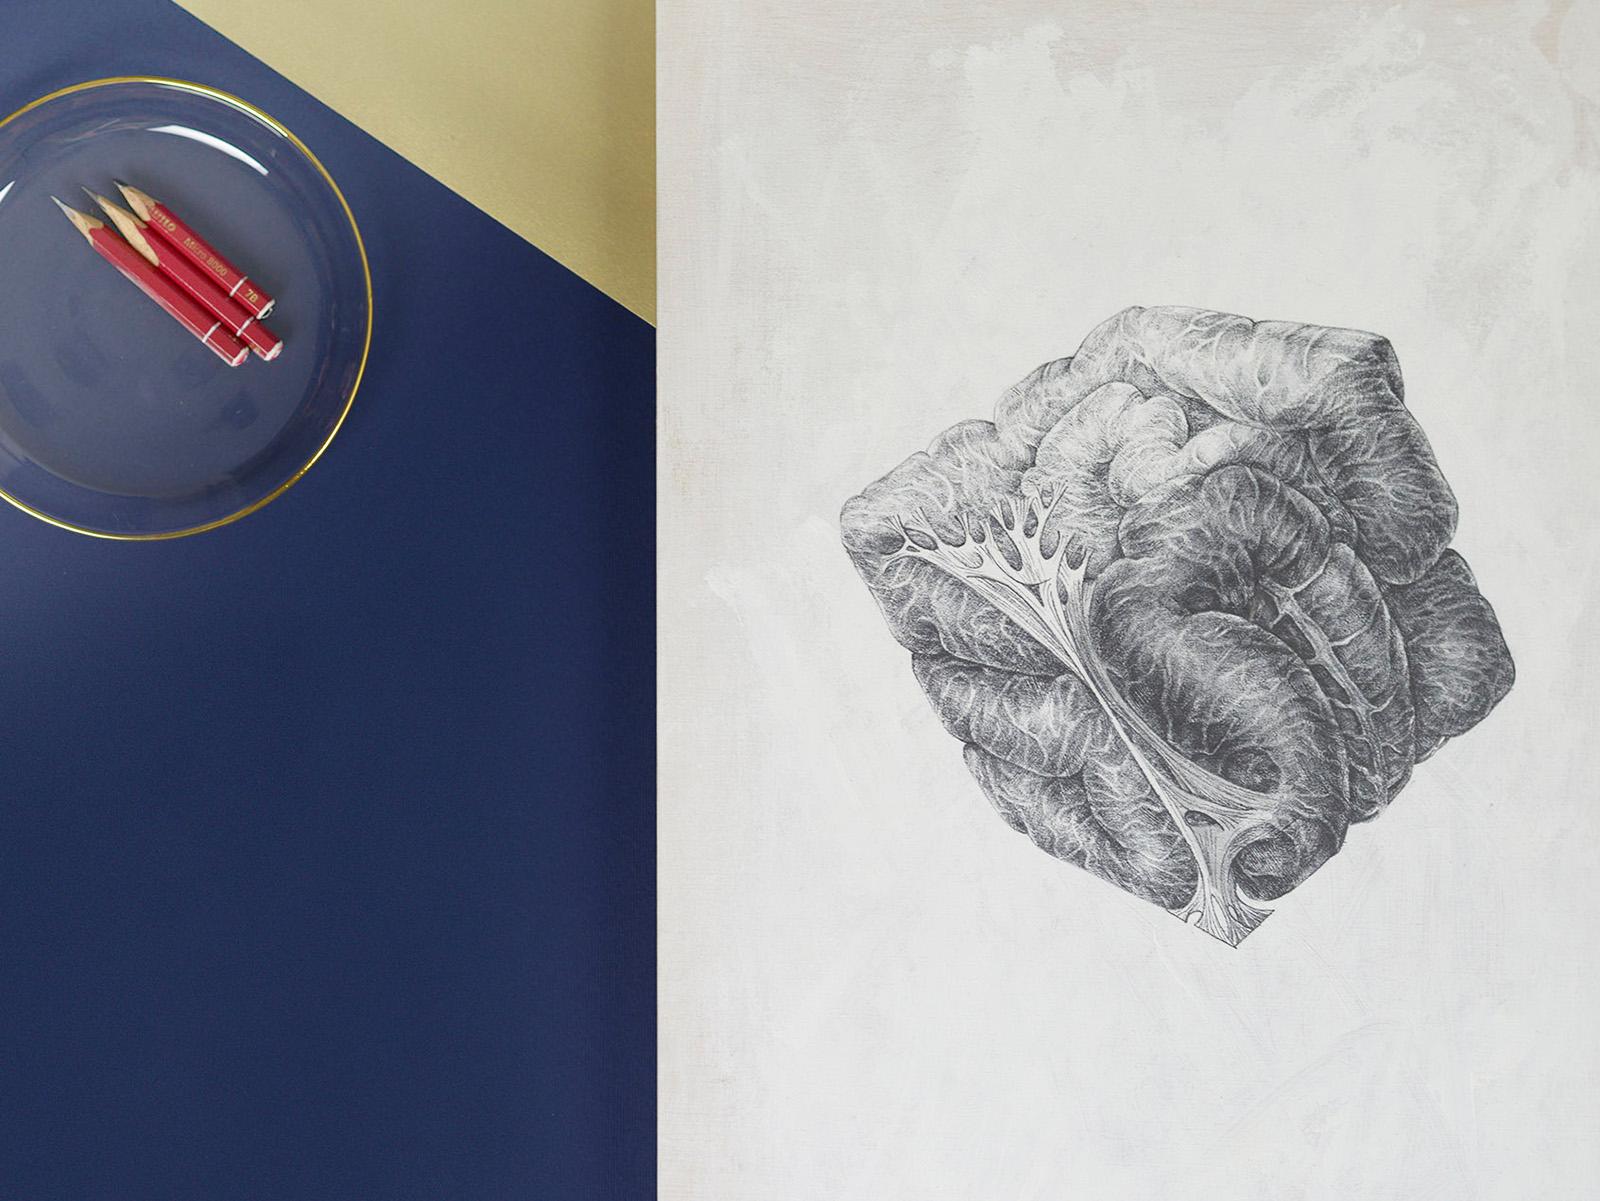 ilustracion y arte hecha por giselle vitali